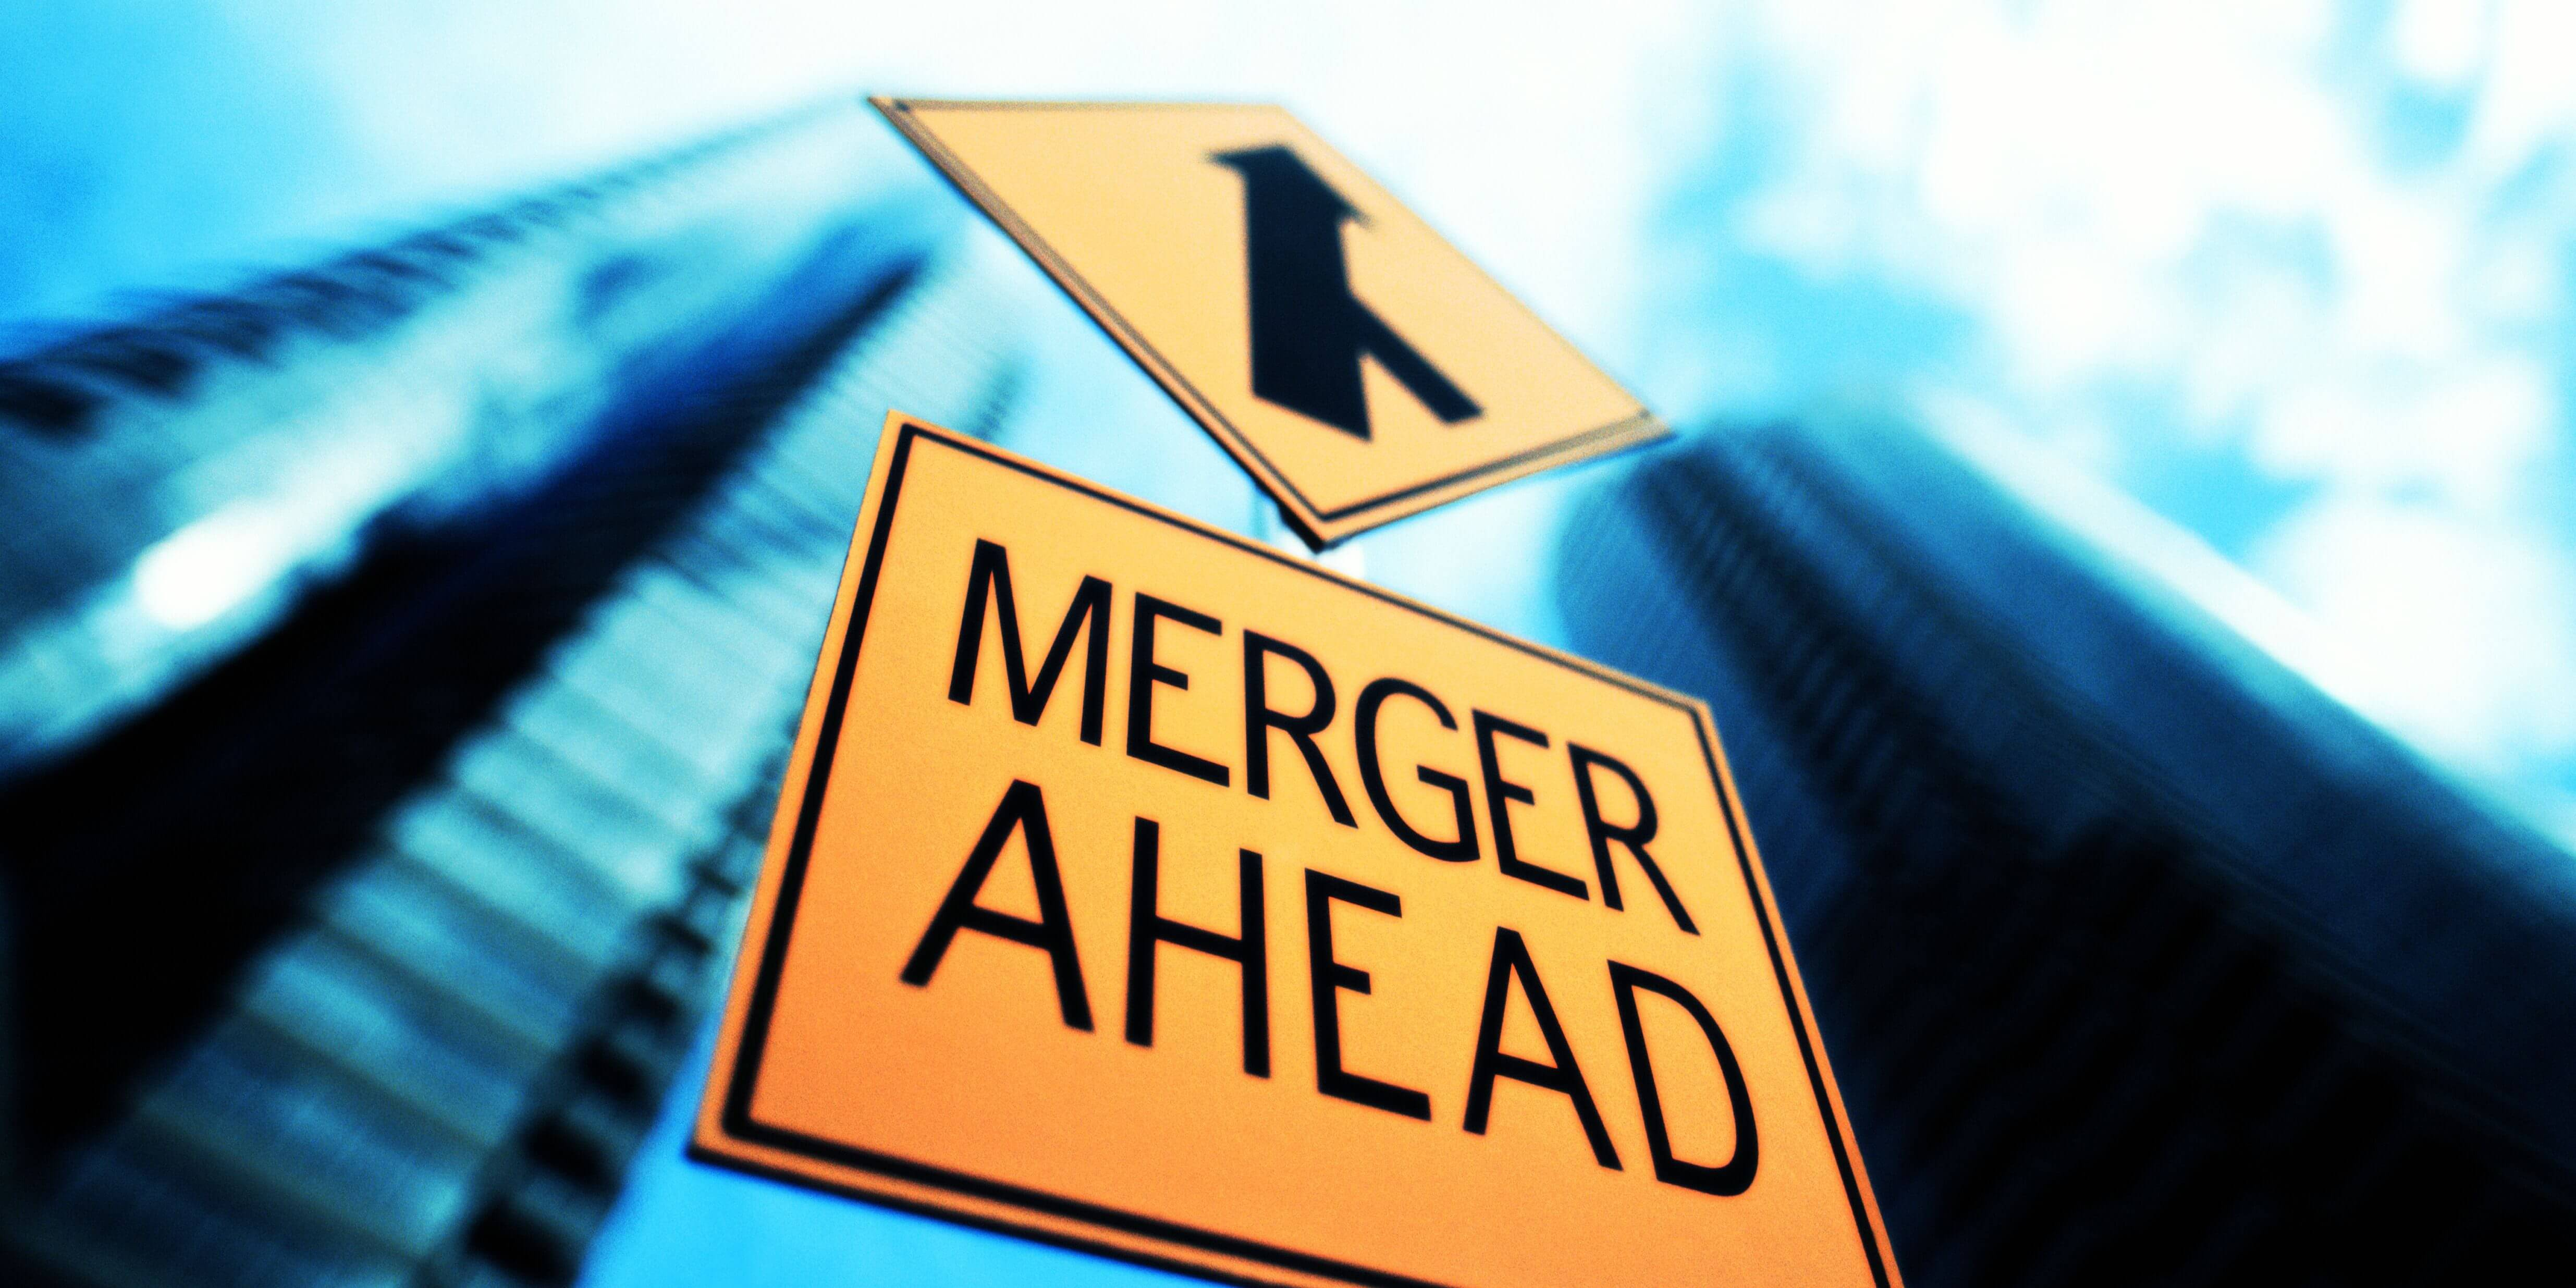 merger-sign-below-office-building